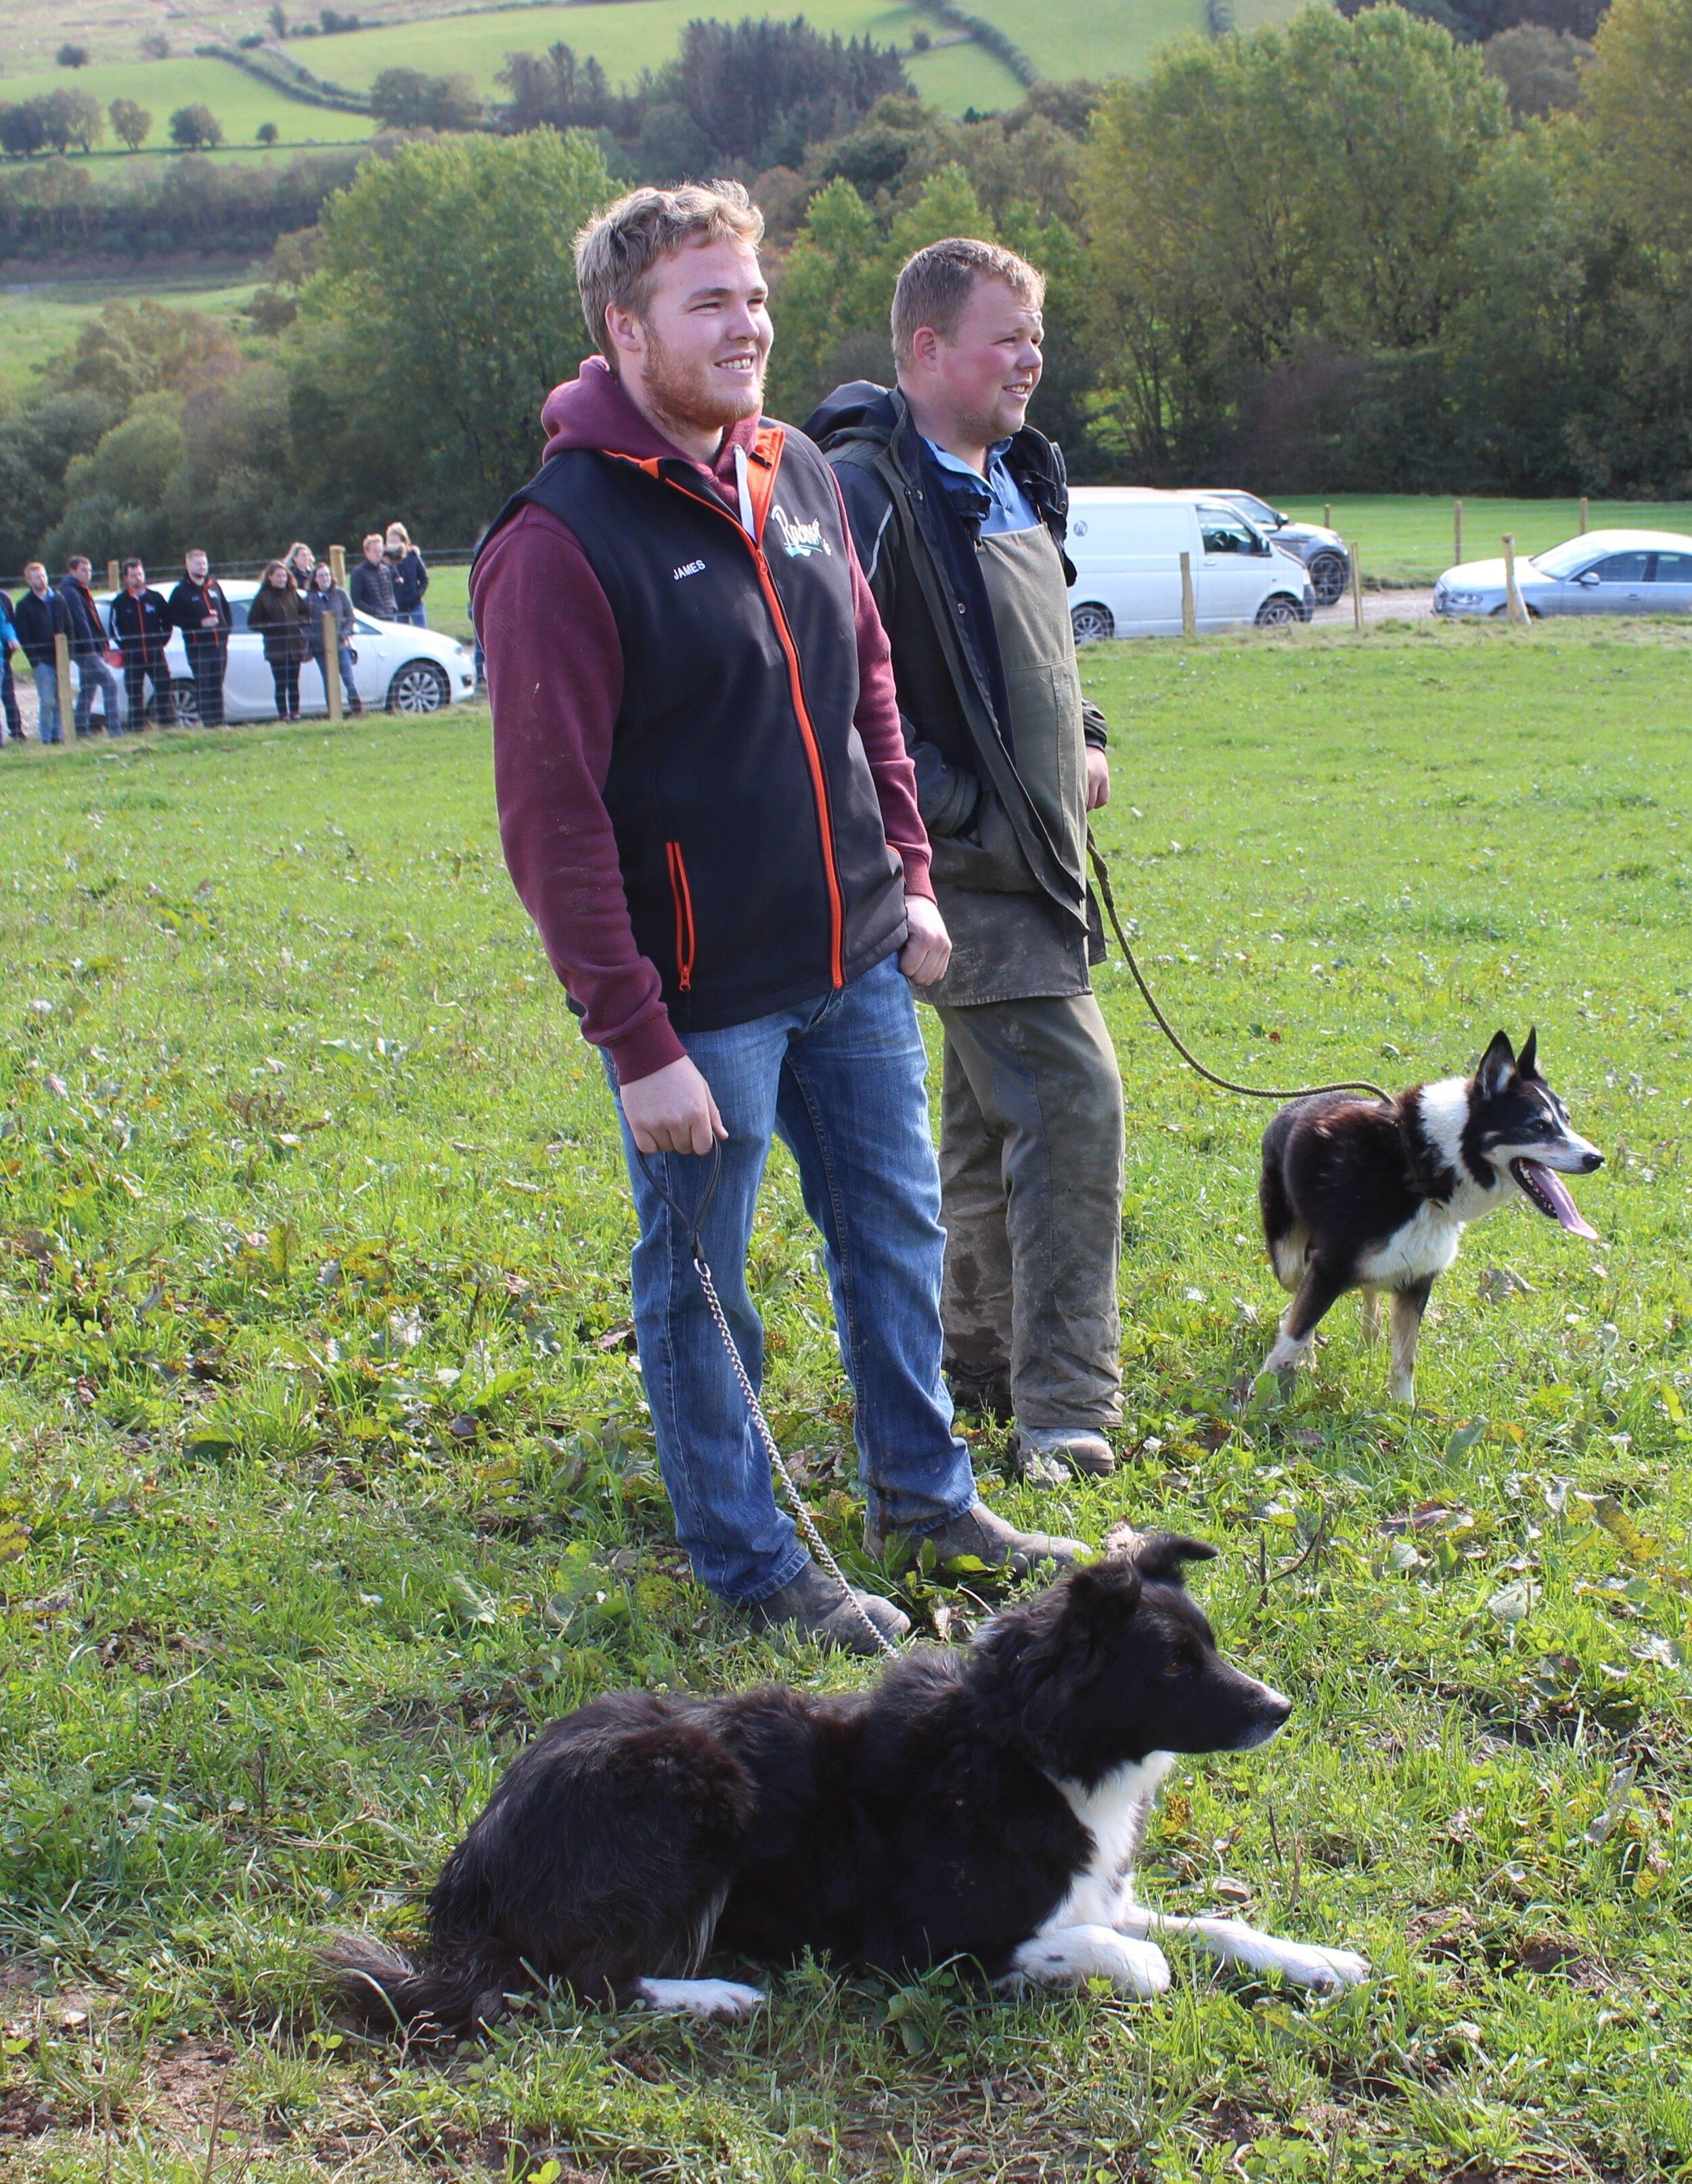 James Griffiths, Penybont YFC & Sam Bowen, Radnor Valley YFC in the Sheepdog Trials.